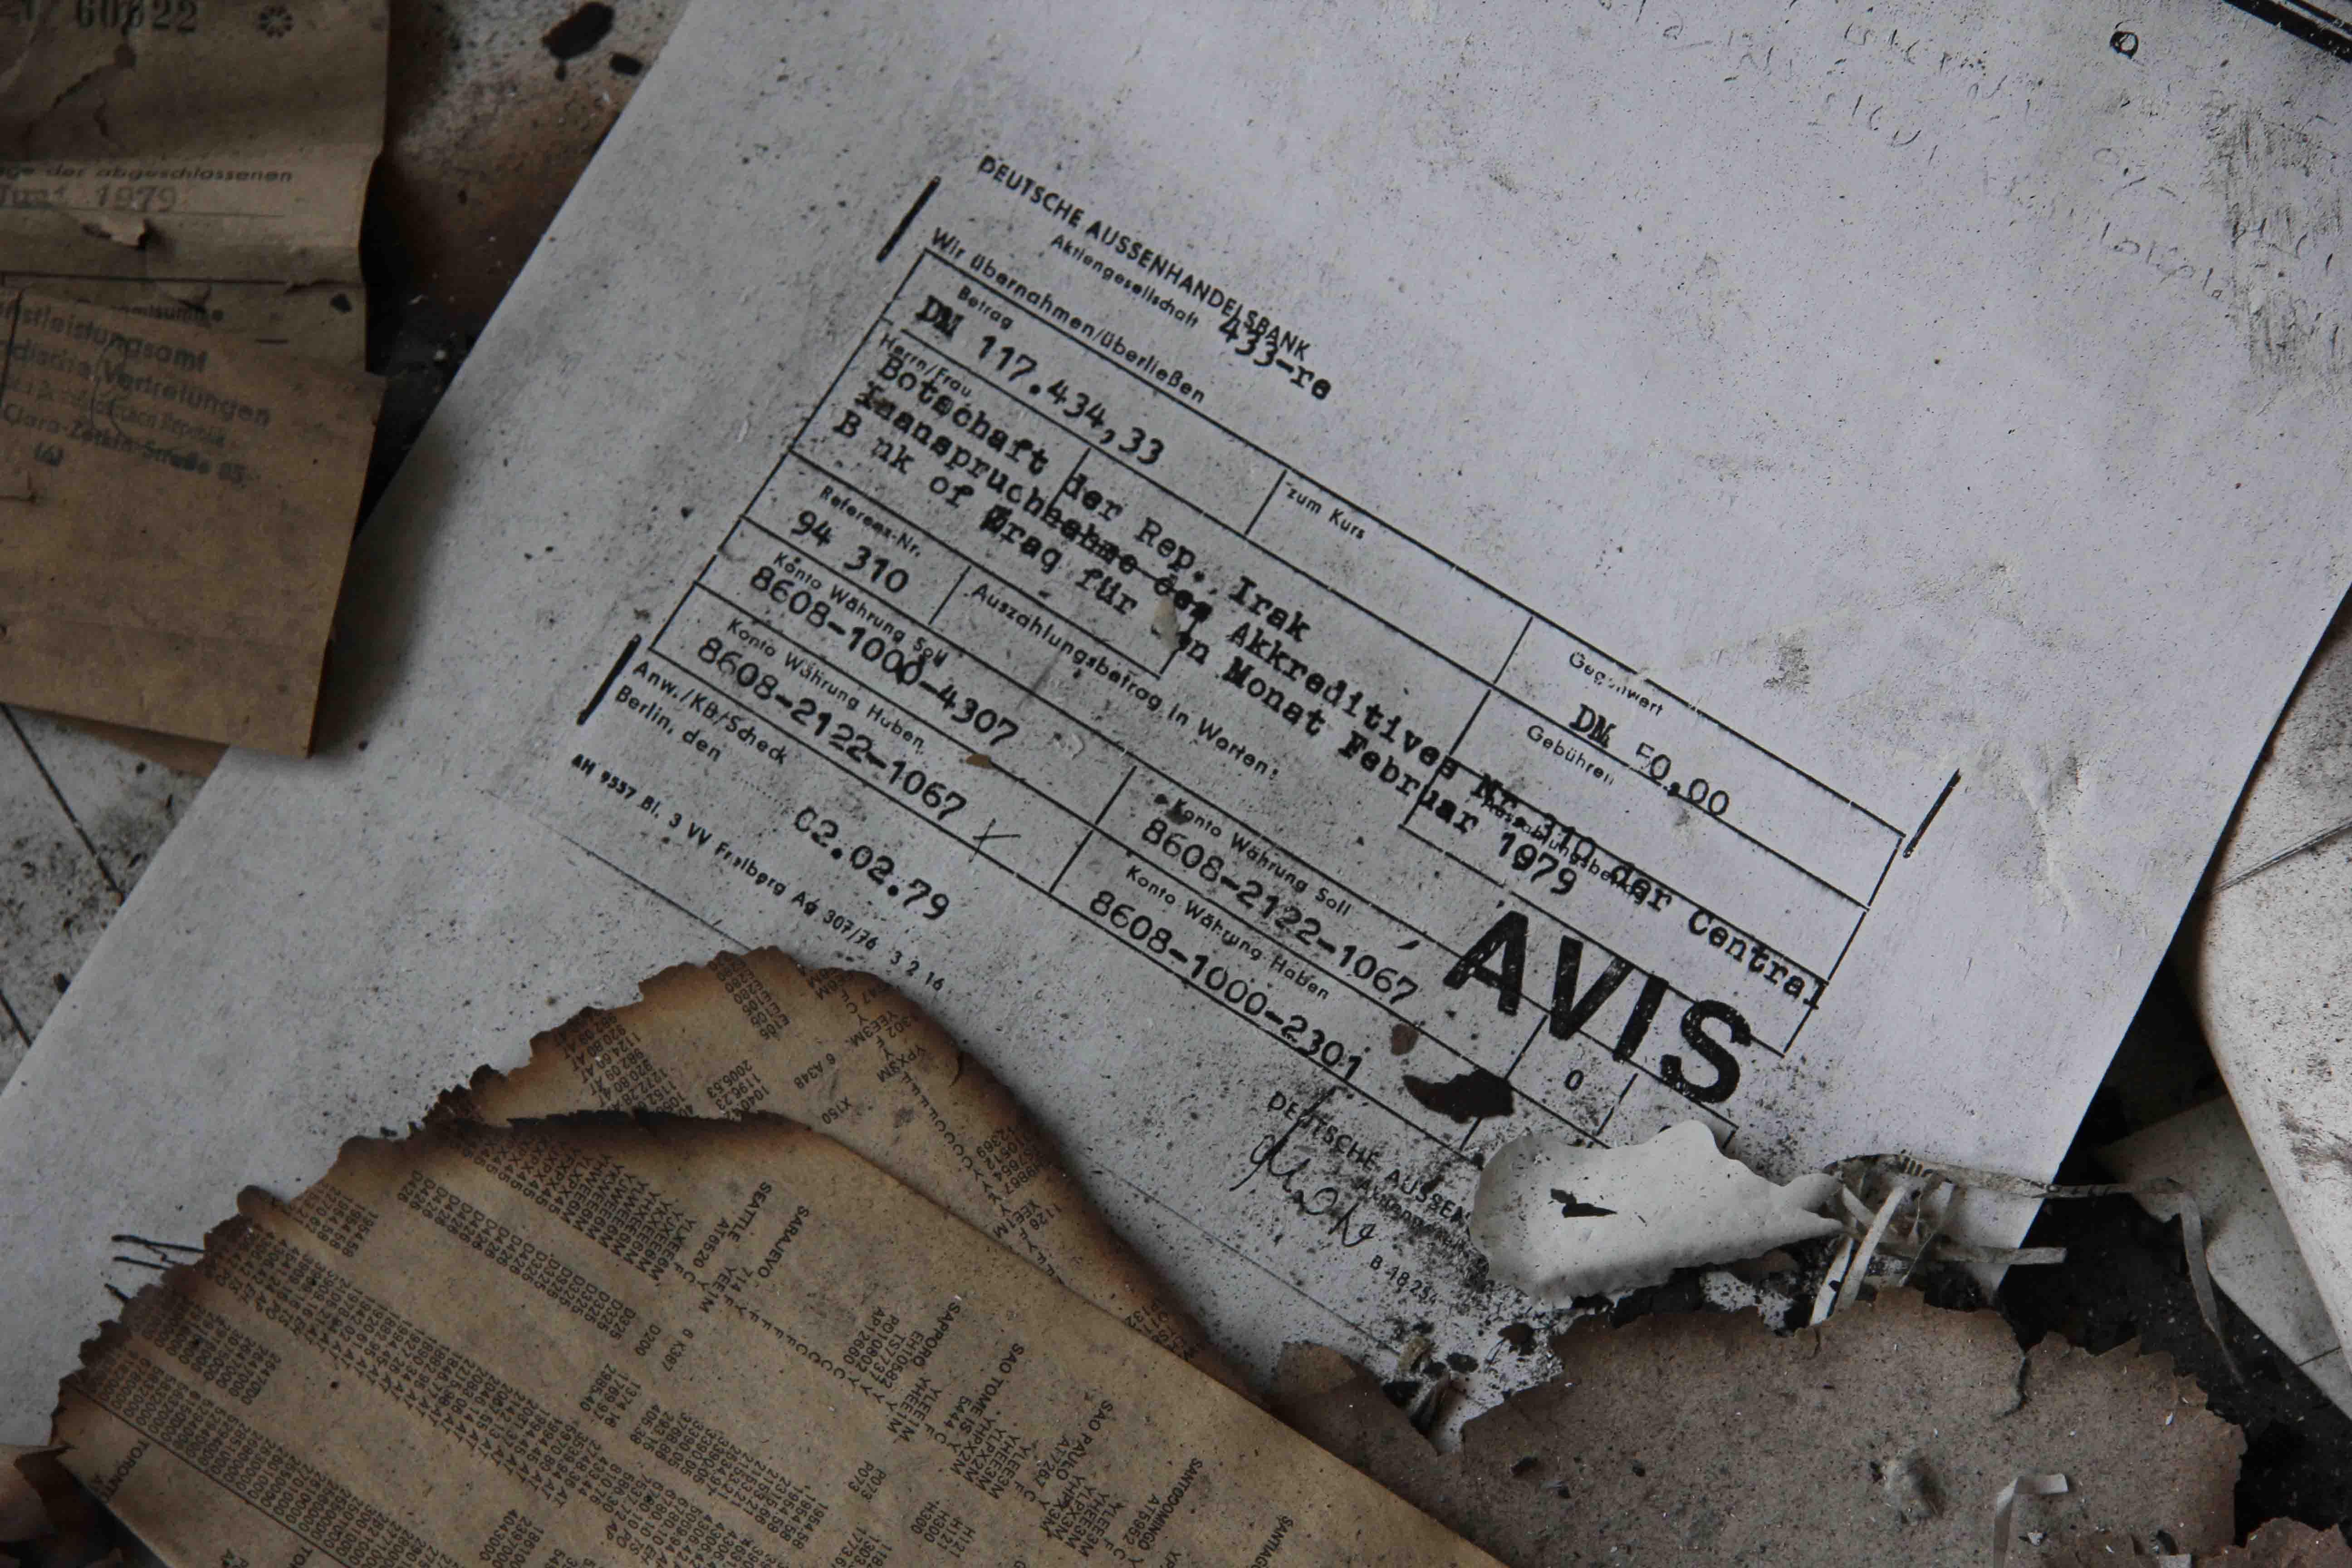 Burnt Paperwork - Abandoned Iraqi Embassy Berlin - Die Verlassene Irakische Botschaft